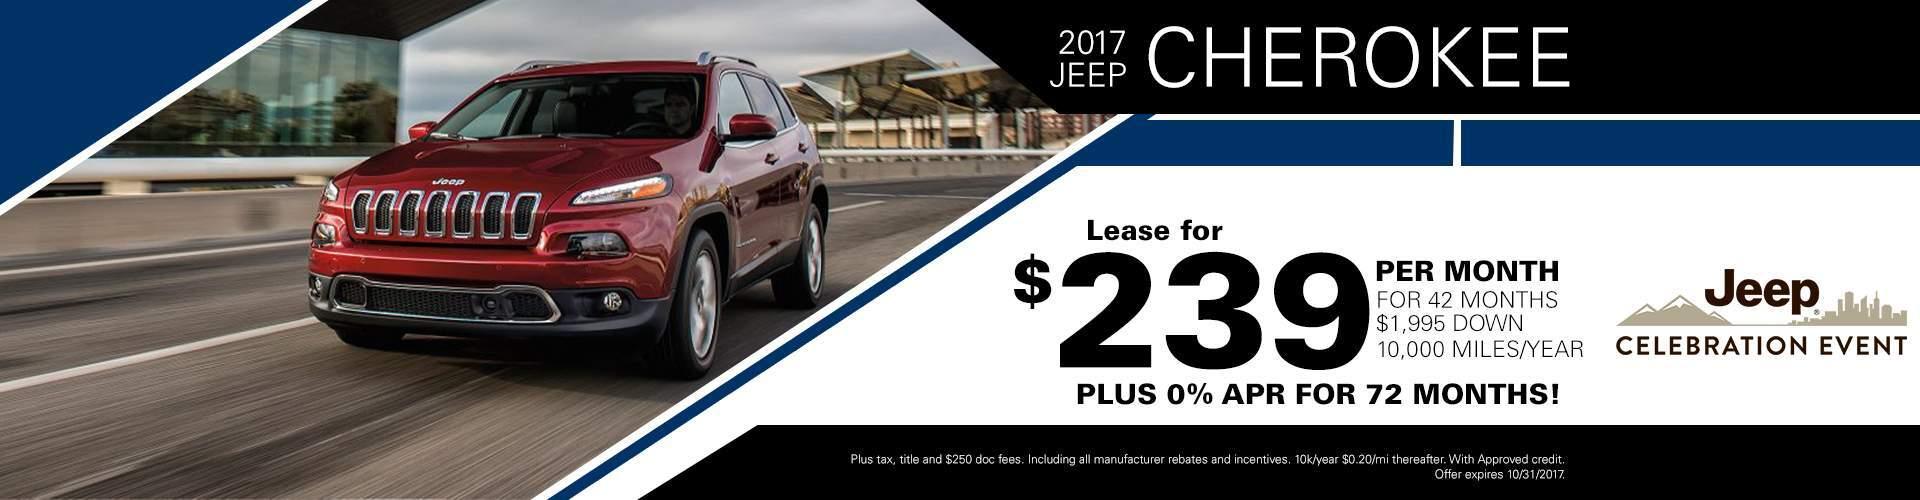 Chrysler Dodge Jeep Ram Kia Dealership Mansfield Oh